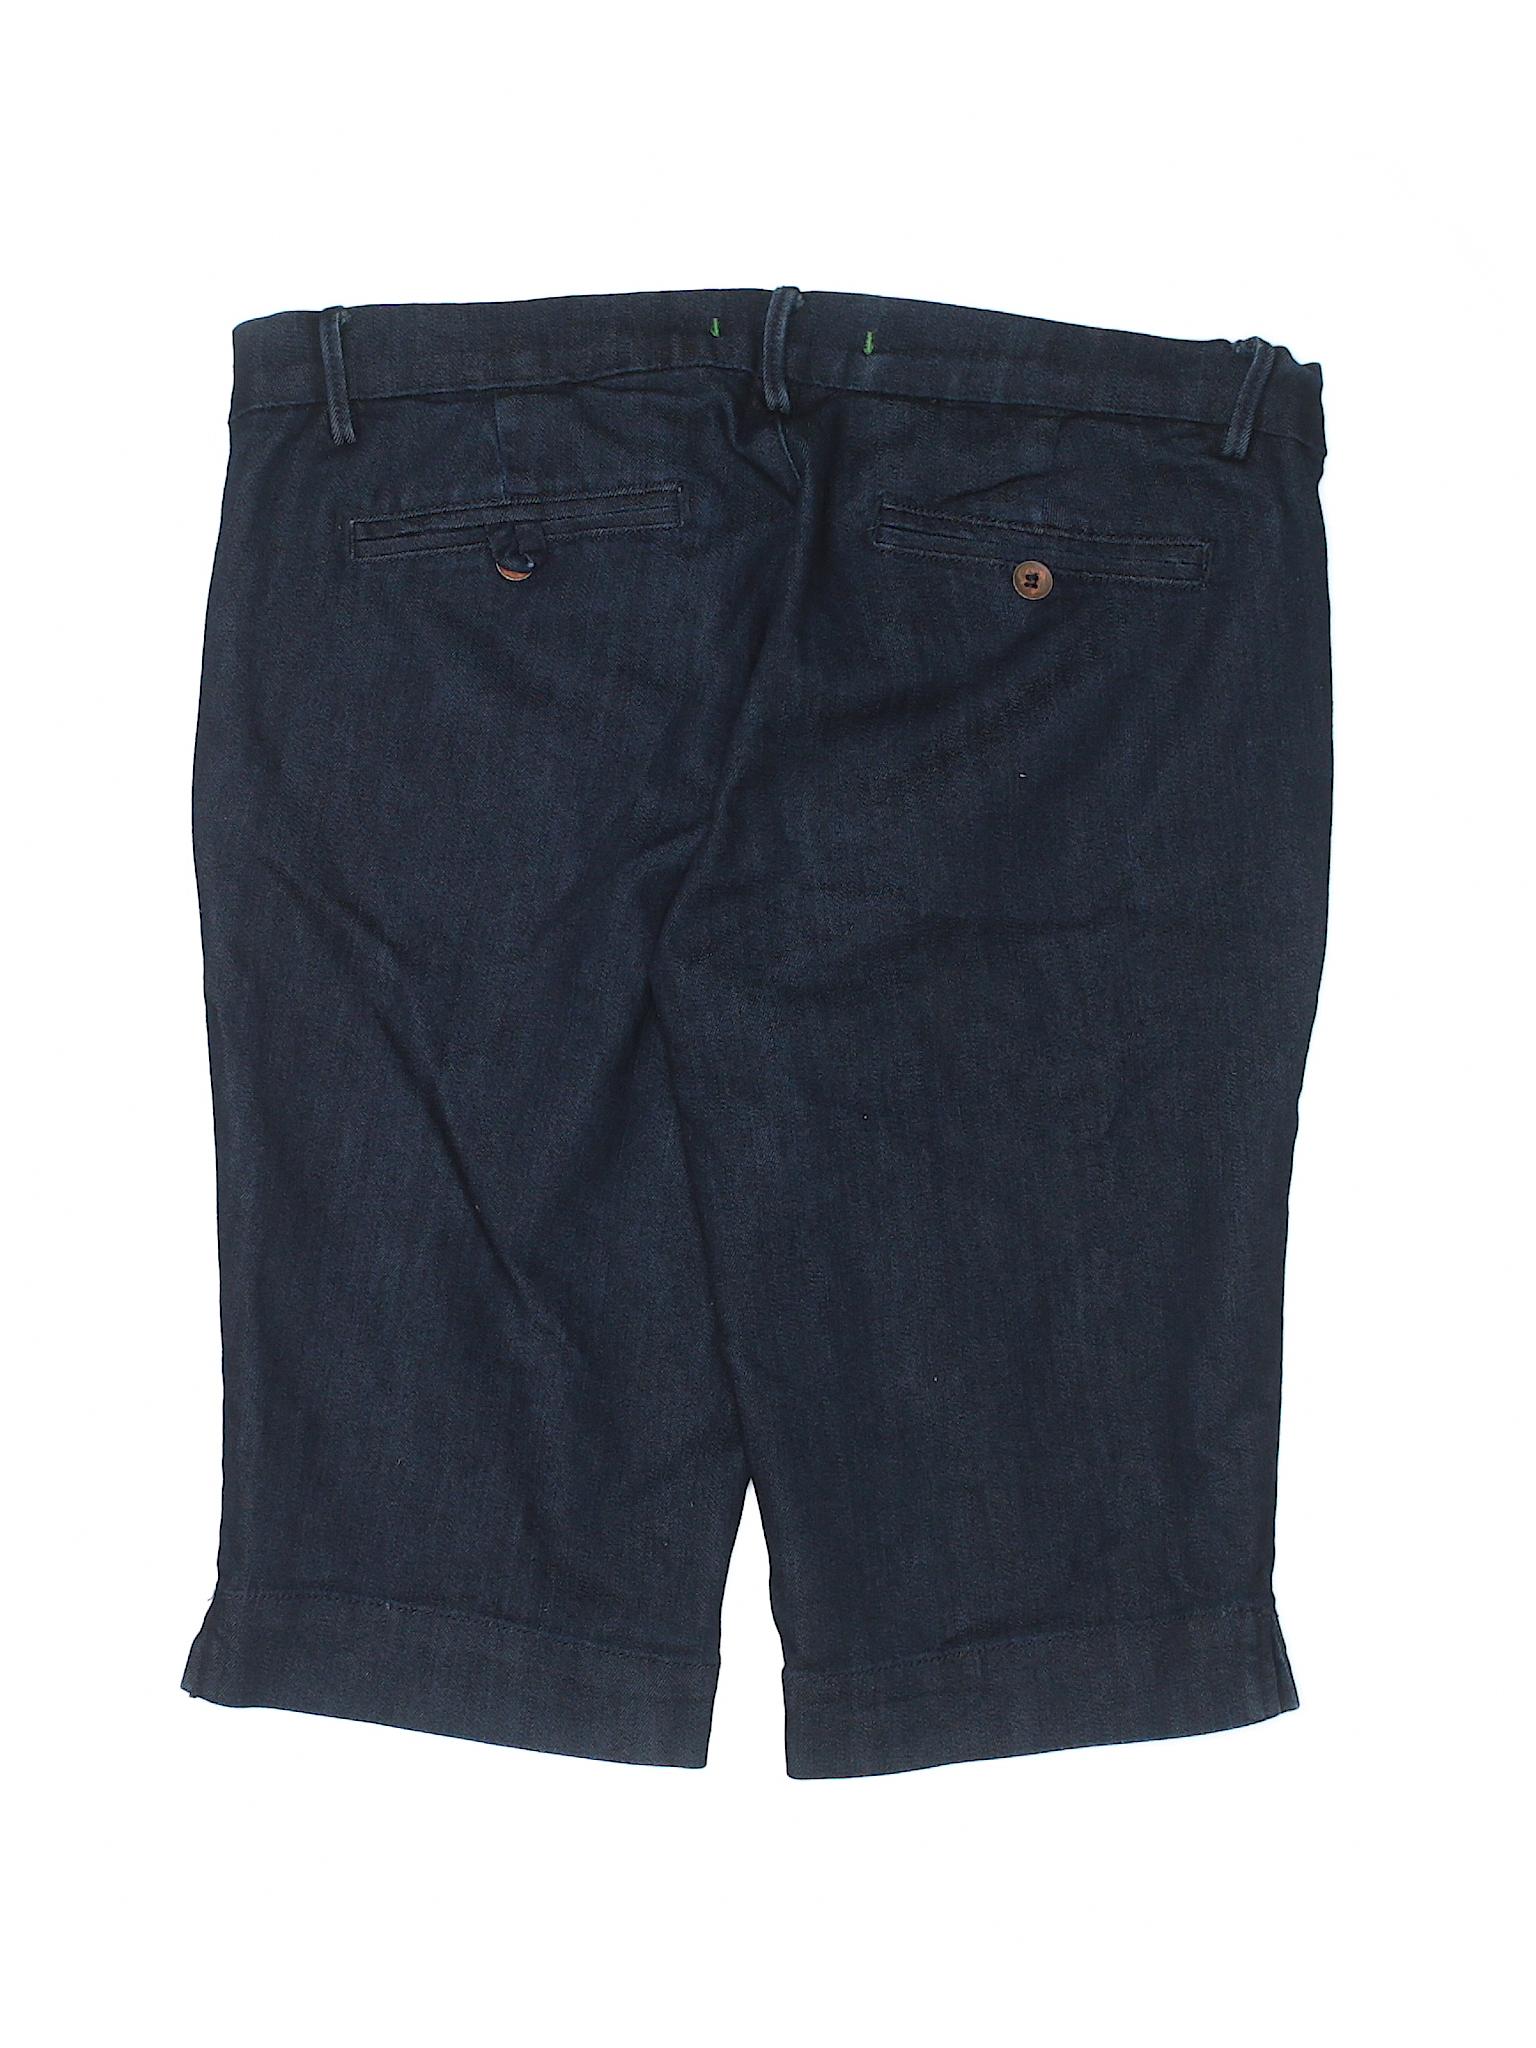 Shorts Boutique Boutique J Shorts Boutique Brand Denim Brand J Denim zESqxwR